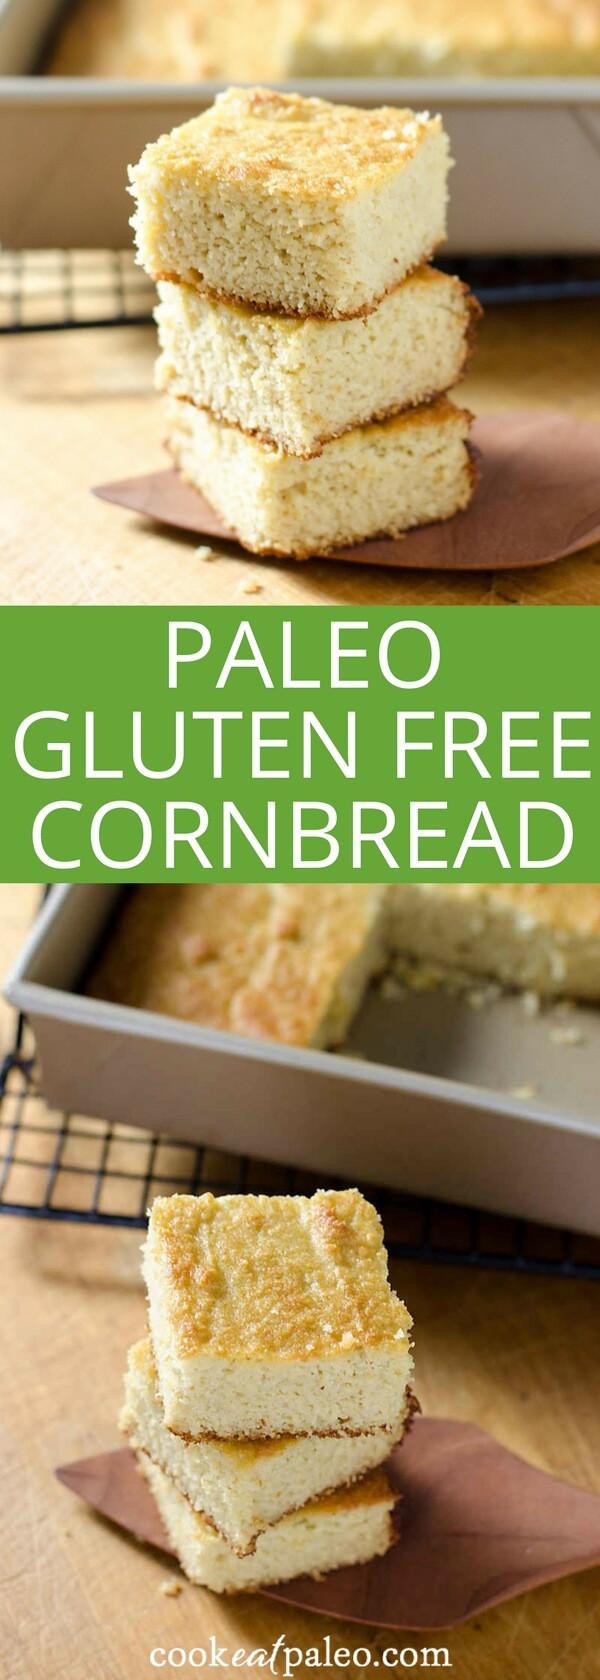 Gluten Free Dairy Free Cornbread Recipe  Paleo Gluten Free Cornbread Recipe